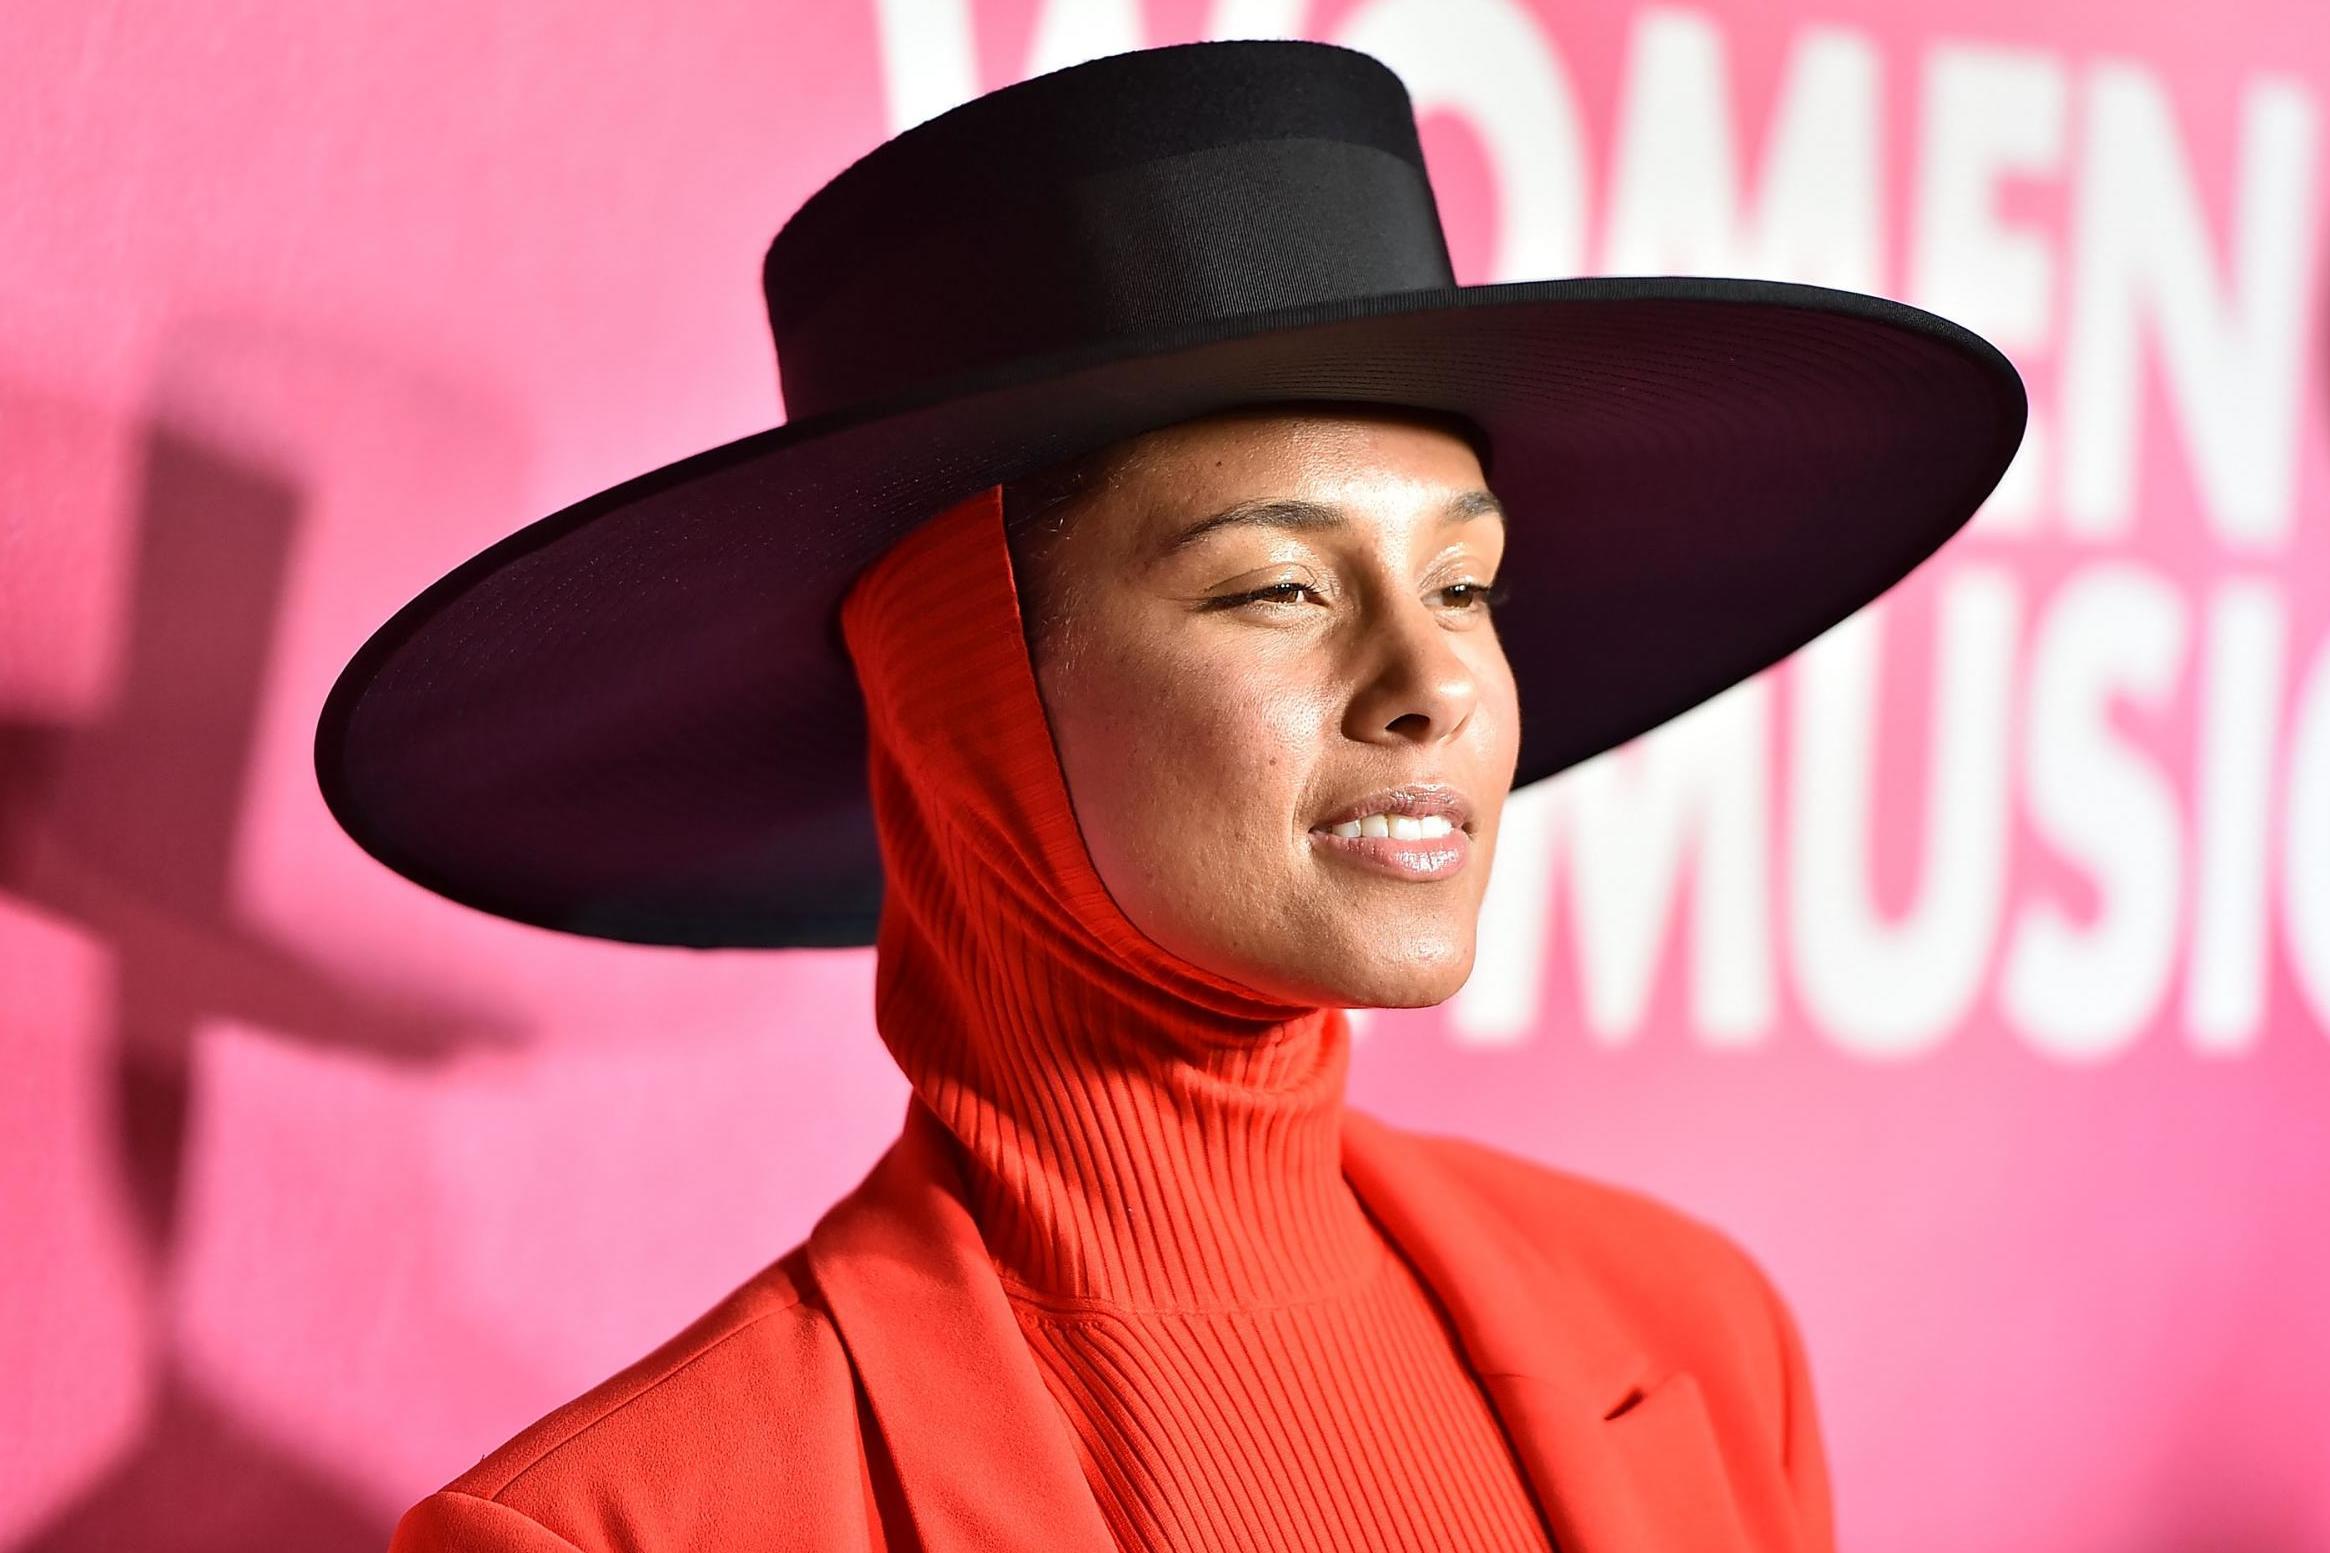 Grammys 2019: Alicia Keys shares video revealing she's hosting the